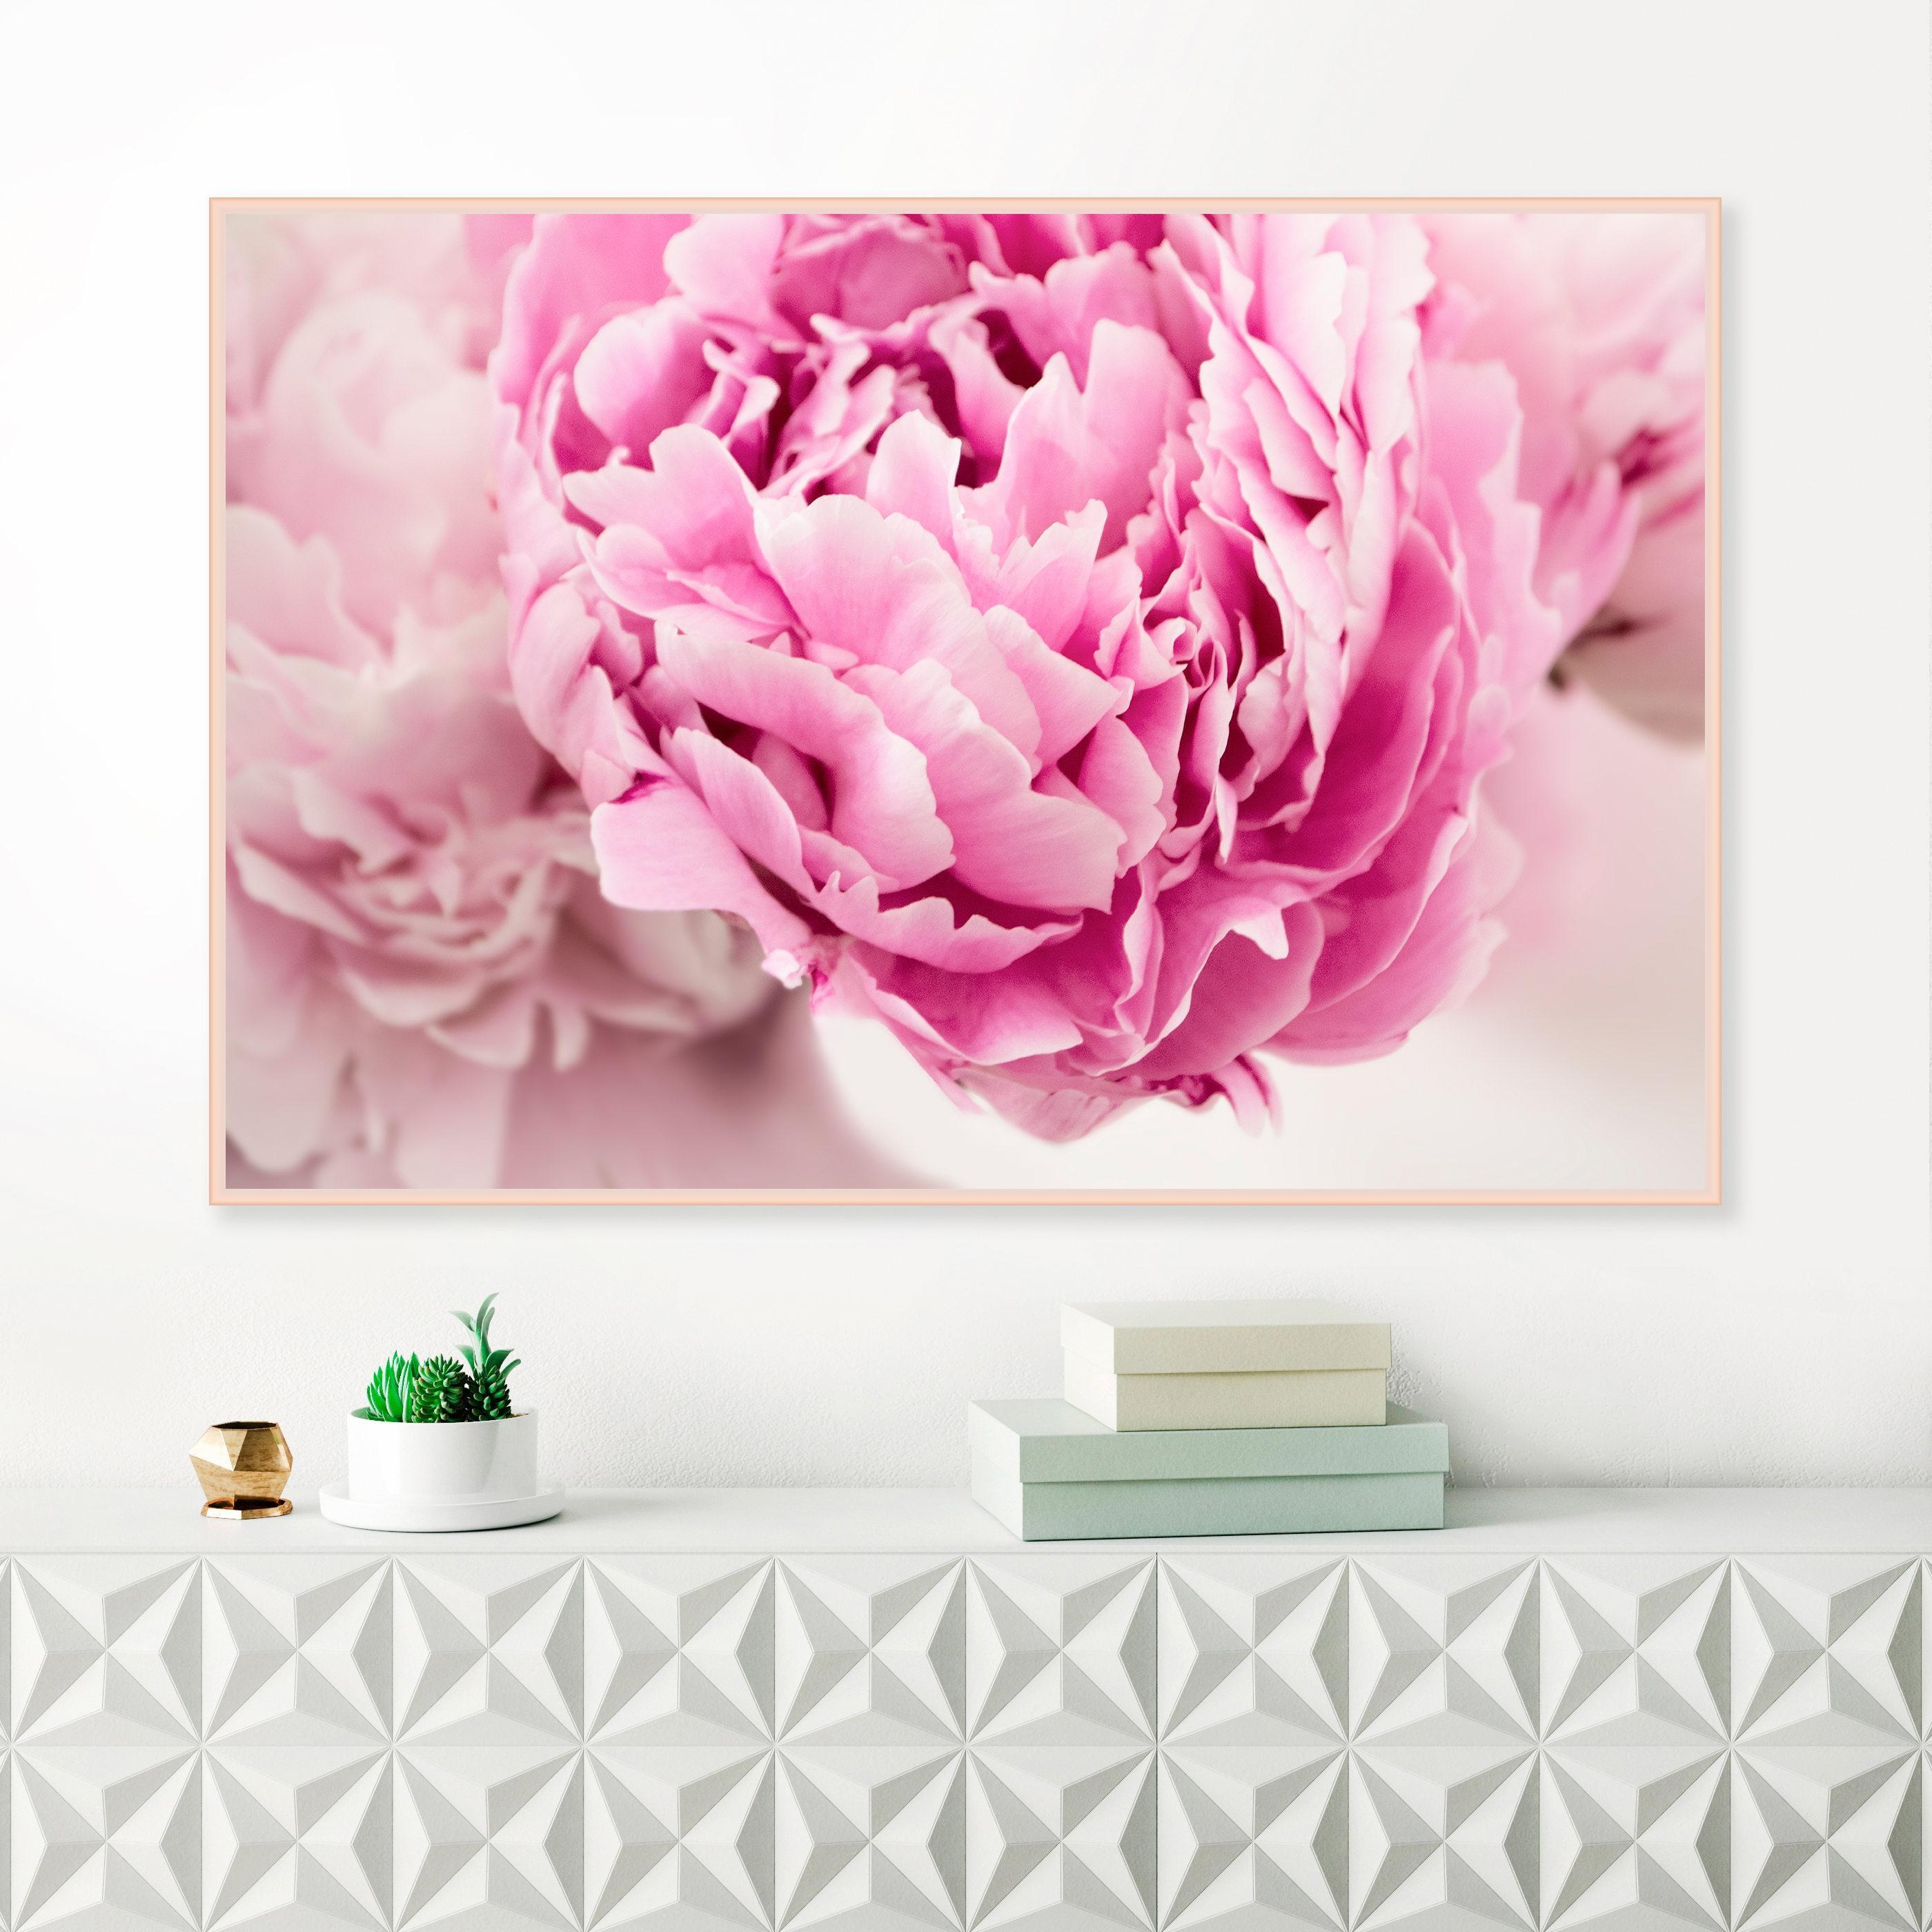 Pink Peonies Print, Pink Flower Prints, Botanical Wall Art In Pink Flower Wall Art (View 17 of 20)